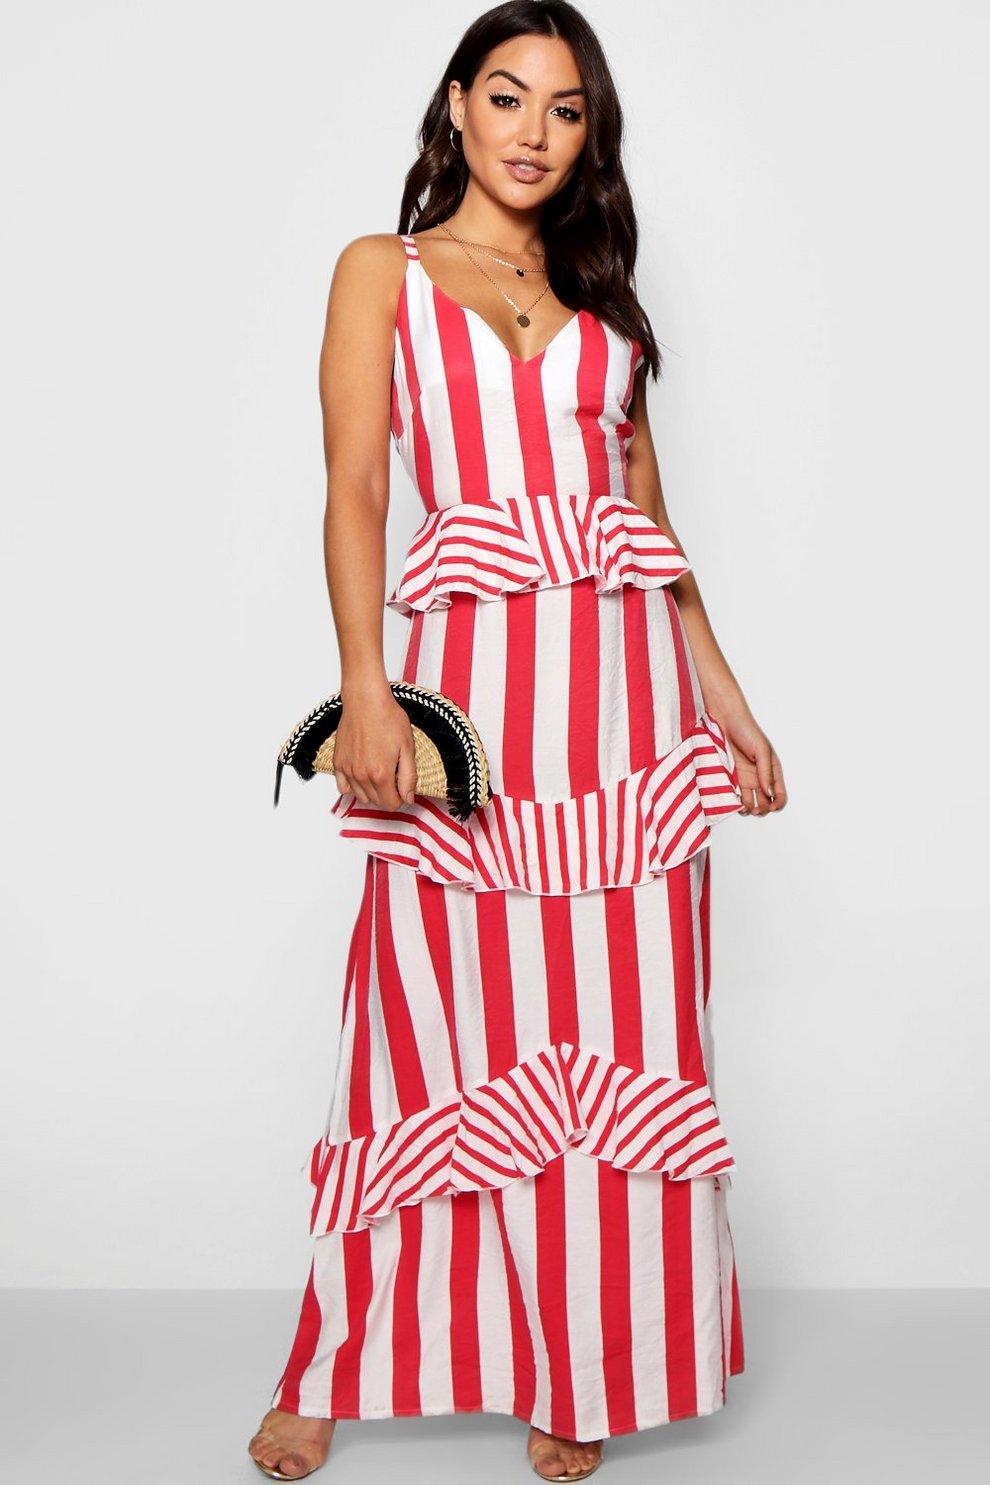 5712d6922988 Lara Ruffle Detail Striped Maxi Dress